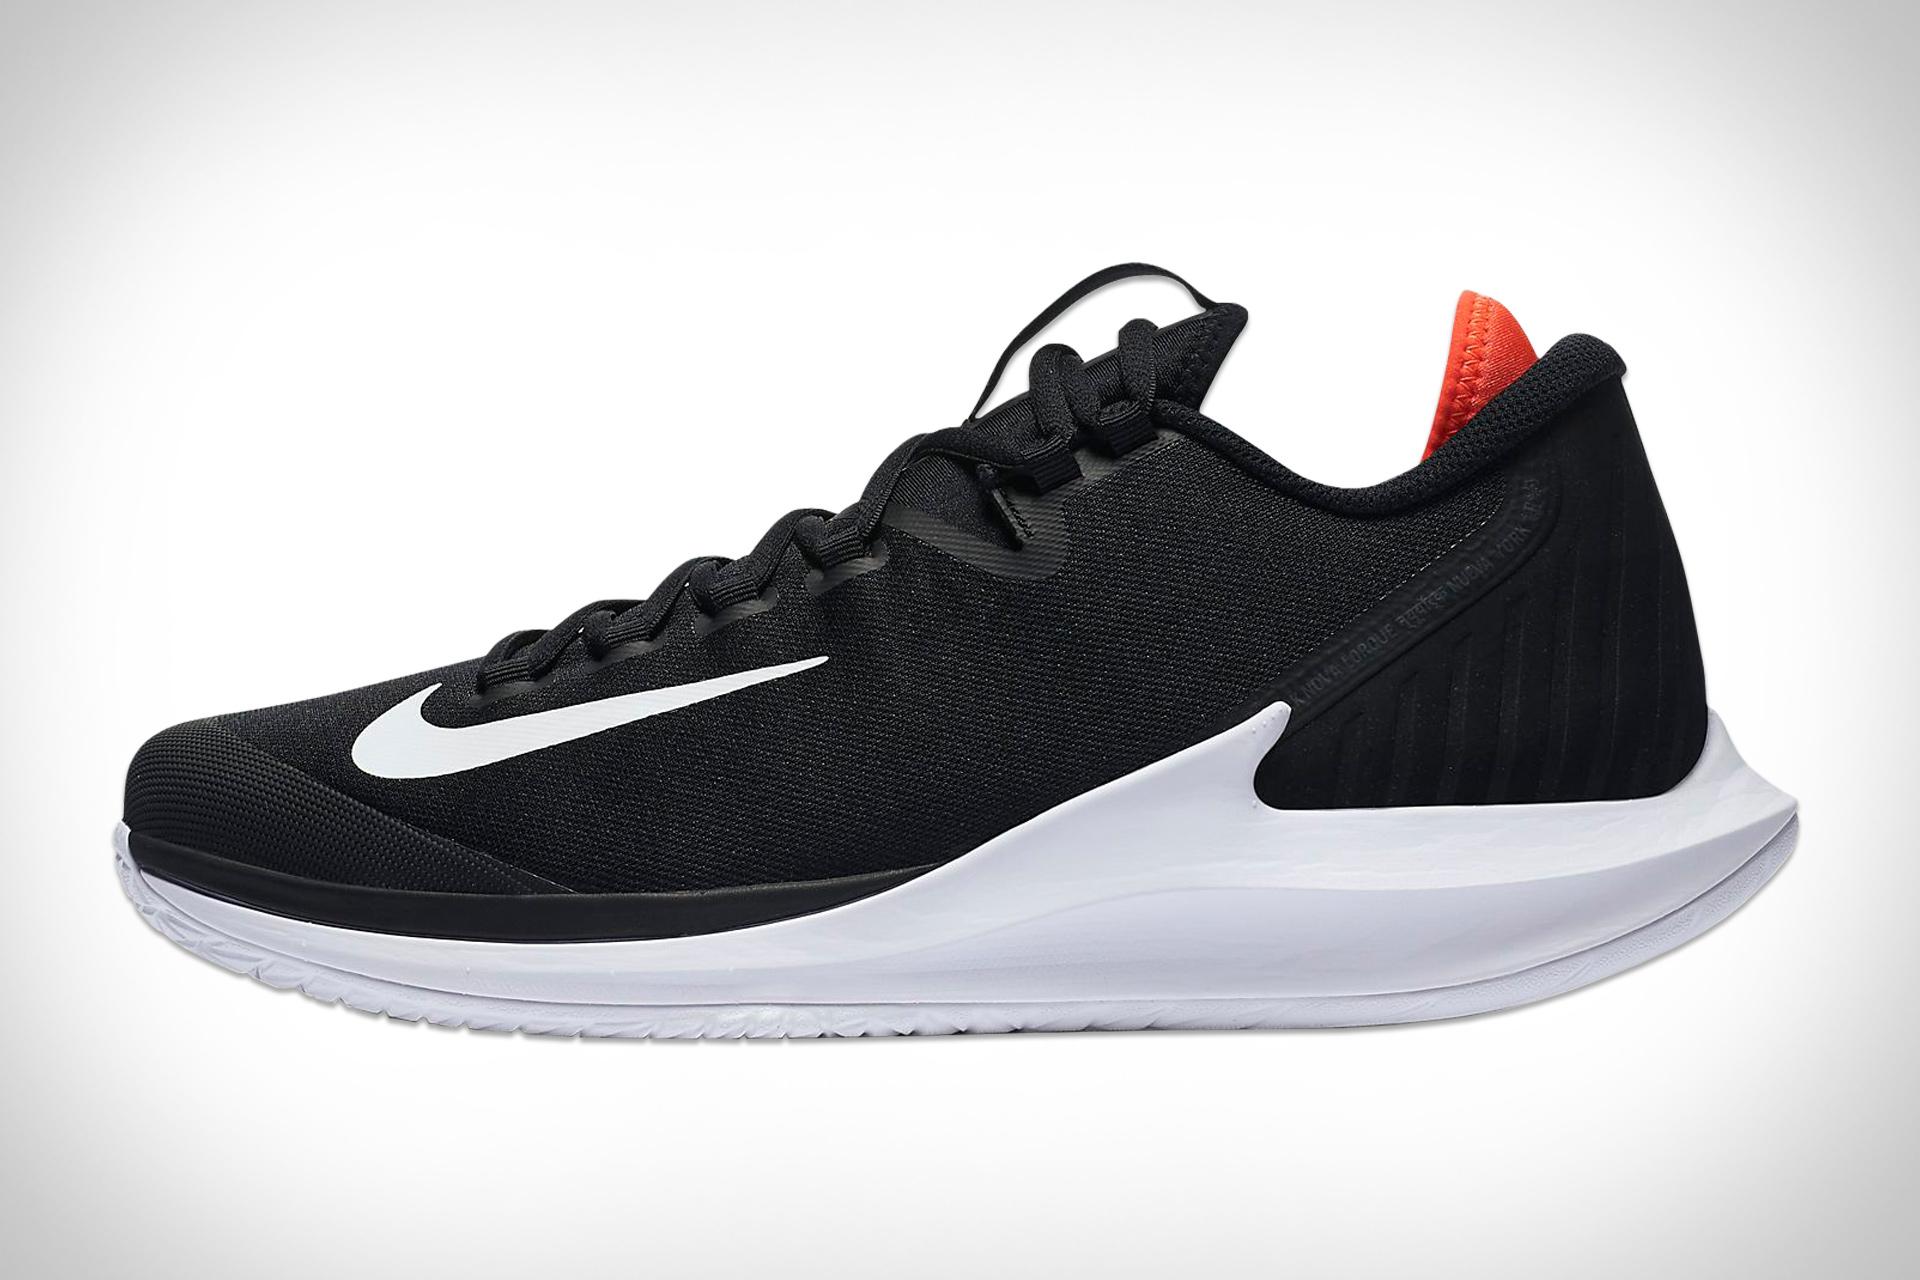 brand new f8345 322cd Le Chaussures de Sport NikeCourt Air Zoom Zero HC | Uncrate